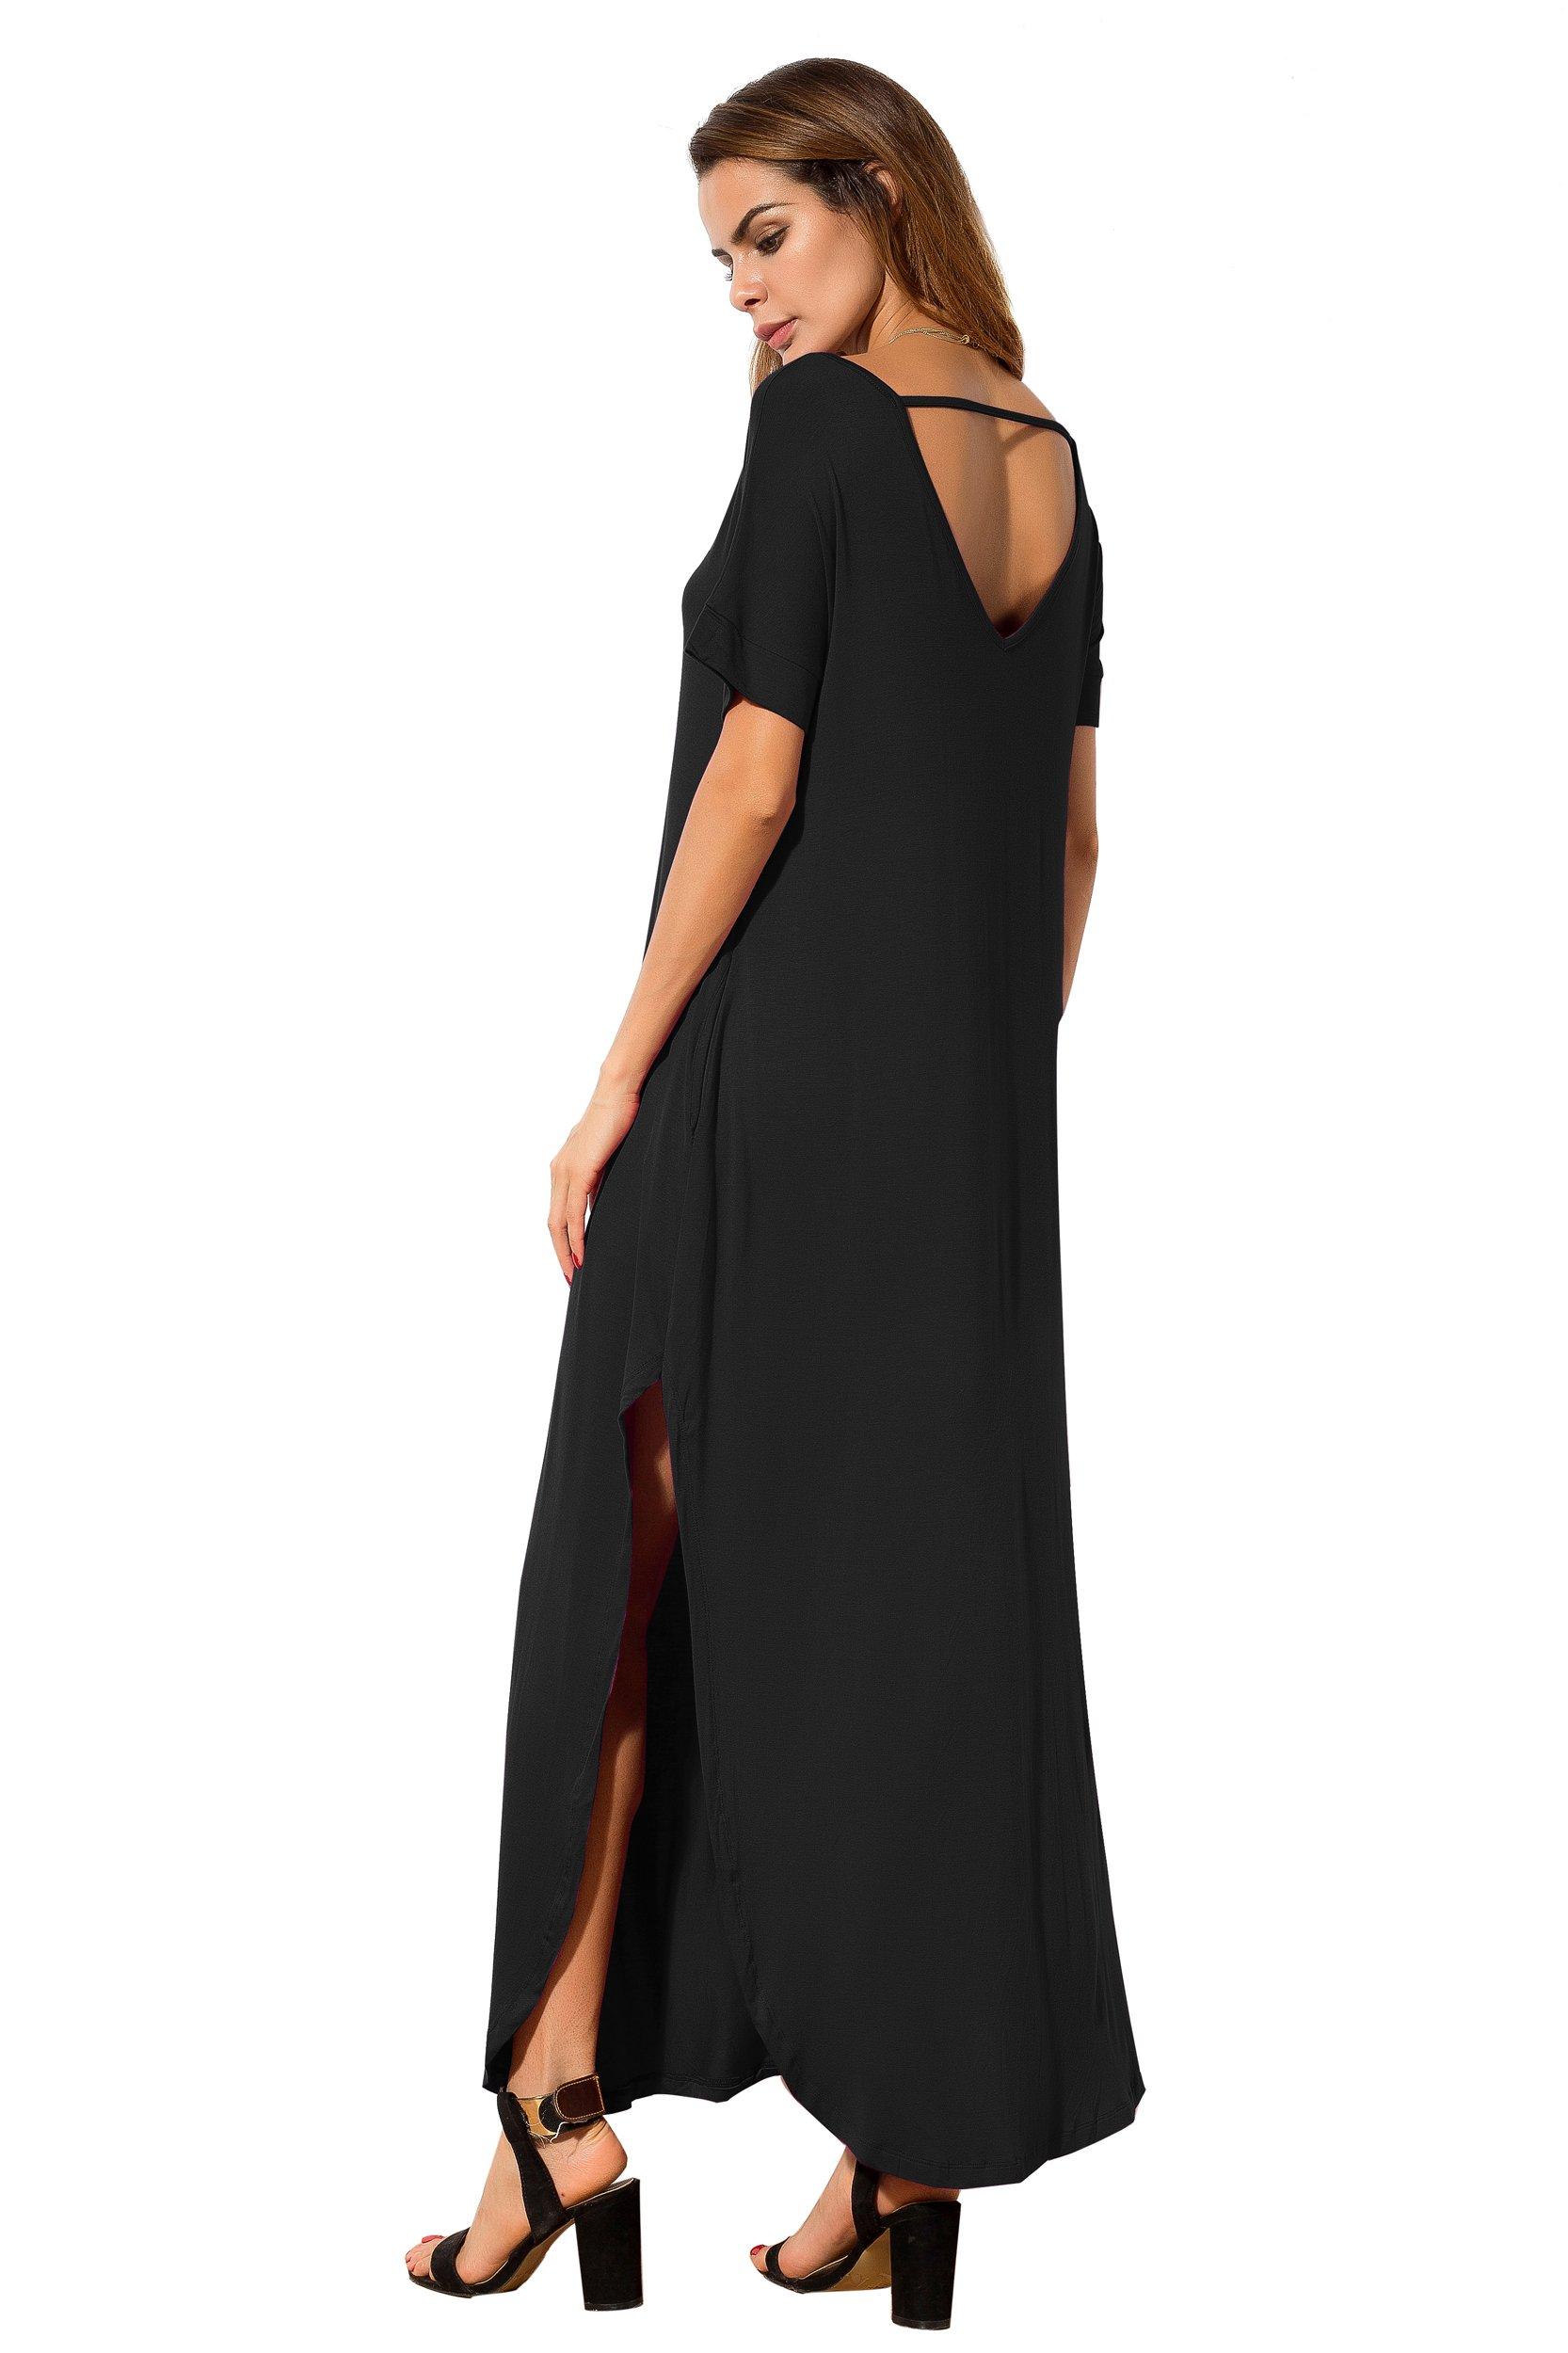 d856e391e6c ... Women s Casual Loose Pocket Long Dress Short Sleeve Split Maxi Dresses.  Sale!